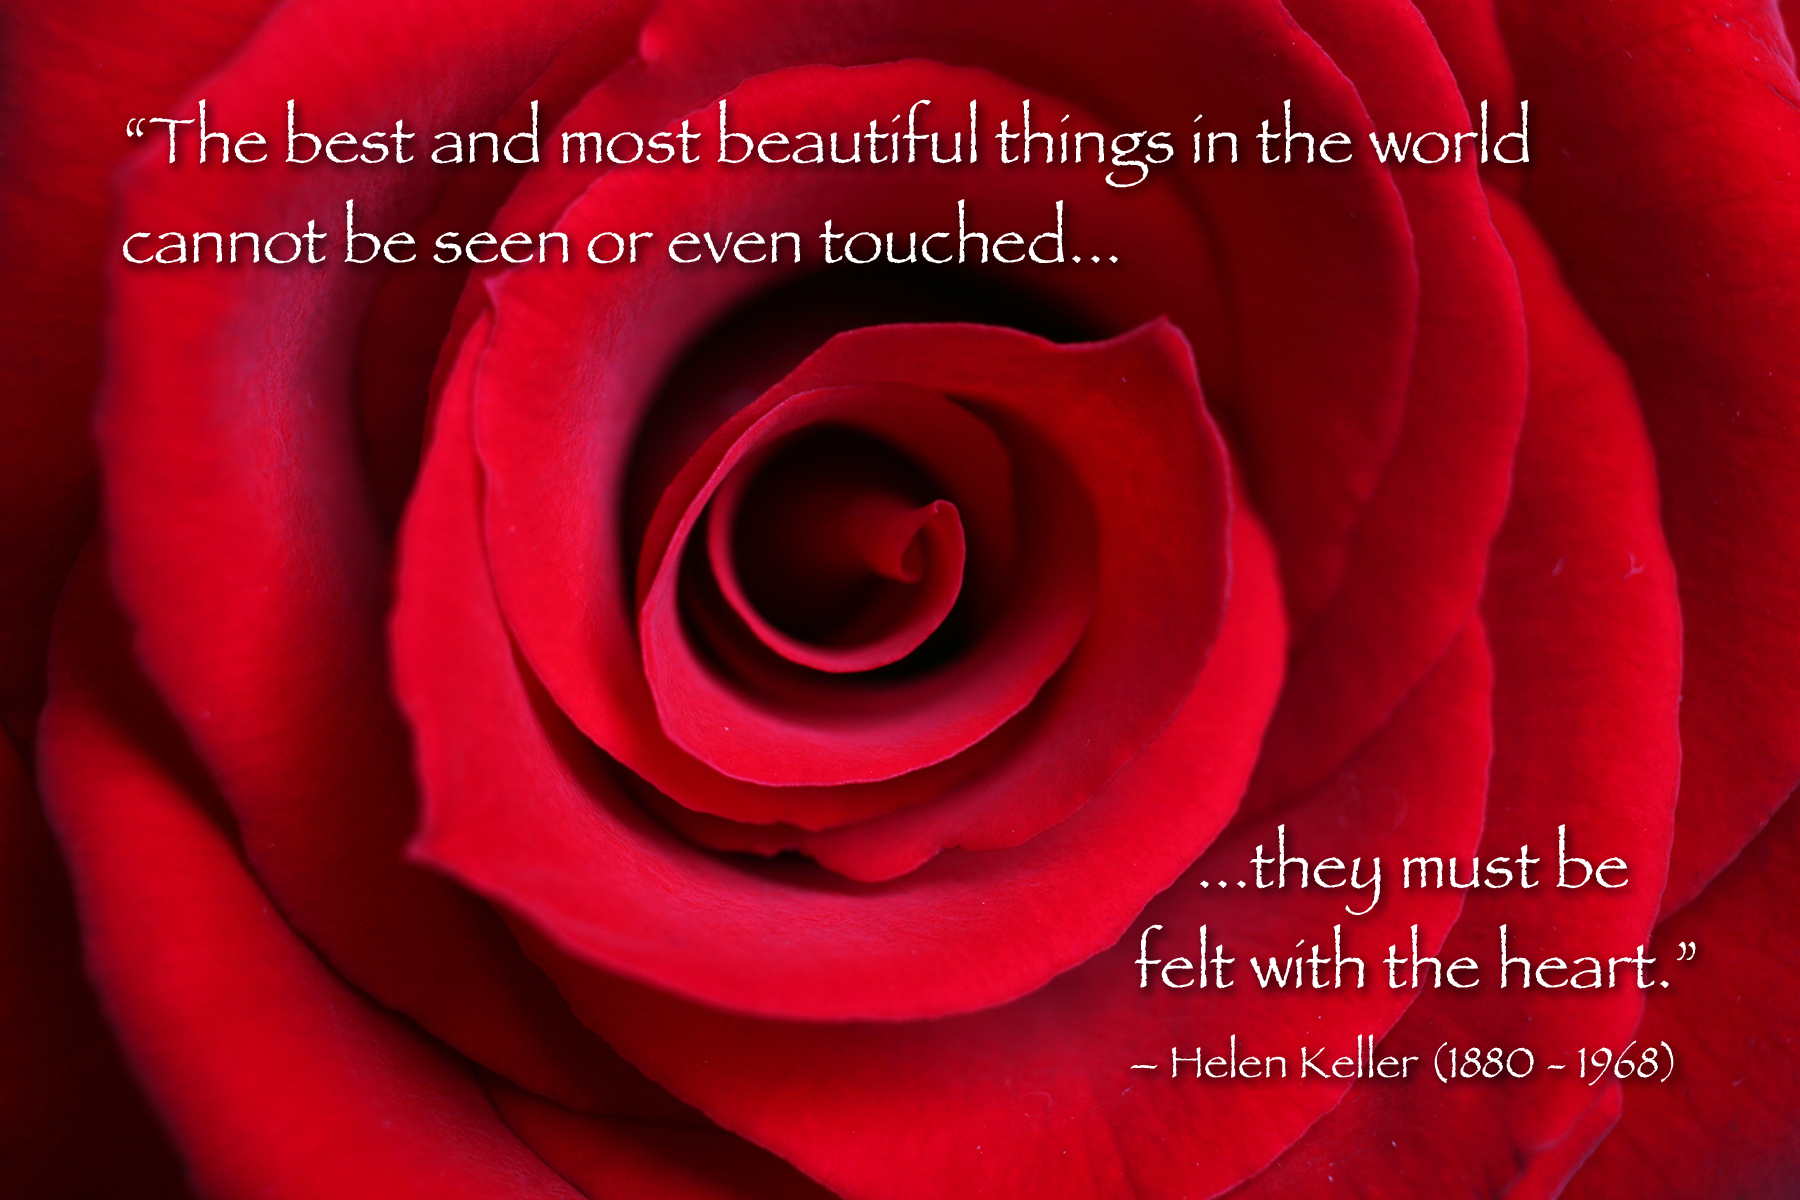 Red Rose Macro With Helen Keller Quote